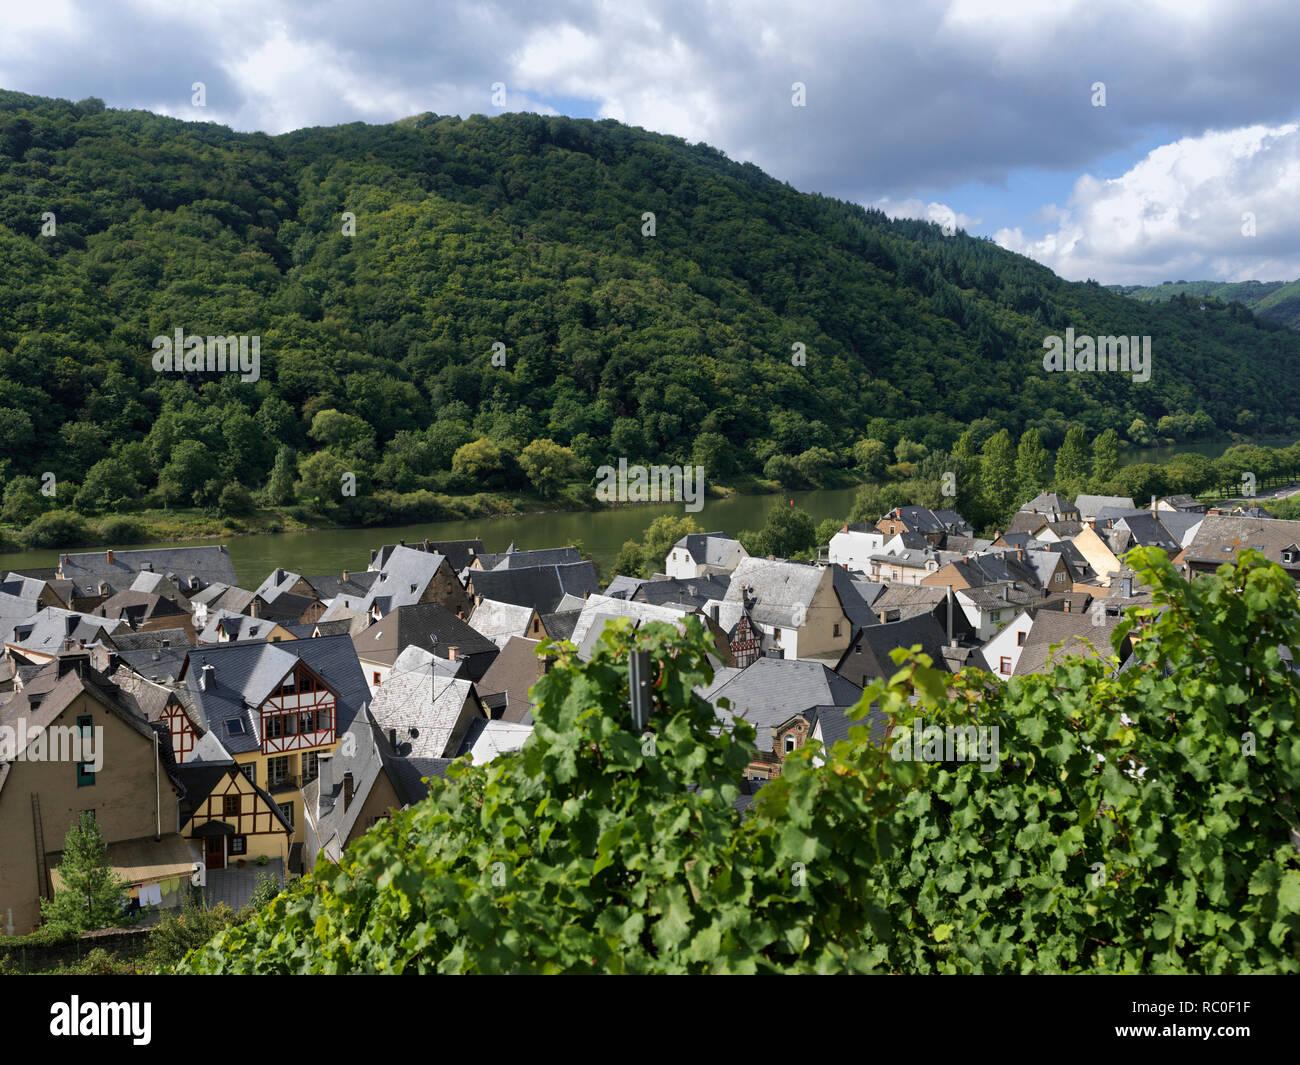 Ediger-Eller, Mittelmosel, Landkreis Cochem-Zell, Rheinland-Pfalz, Deutschland, Europa |  Ediger-Eller, district Cochem-Zell, Middle Moselle, Rhinelan - Stock Image